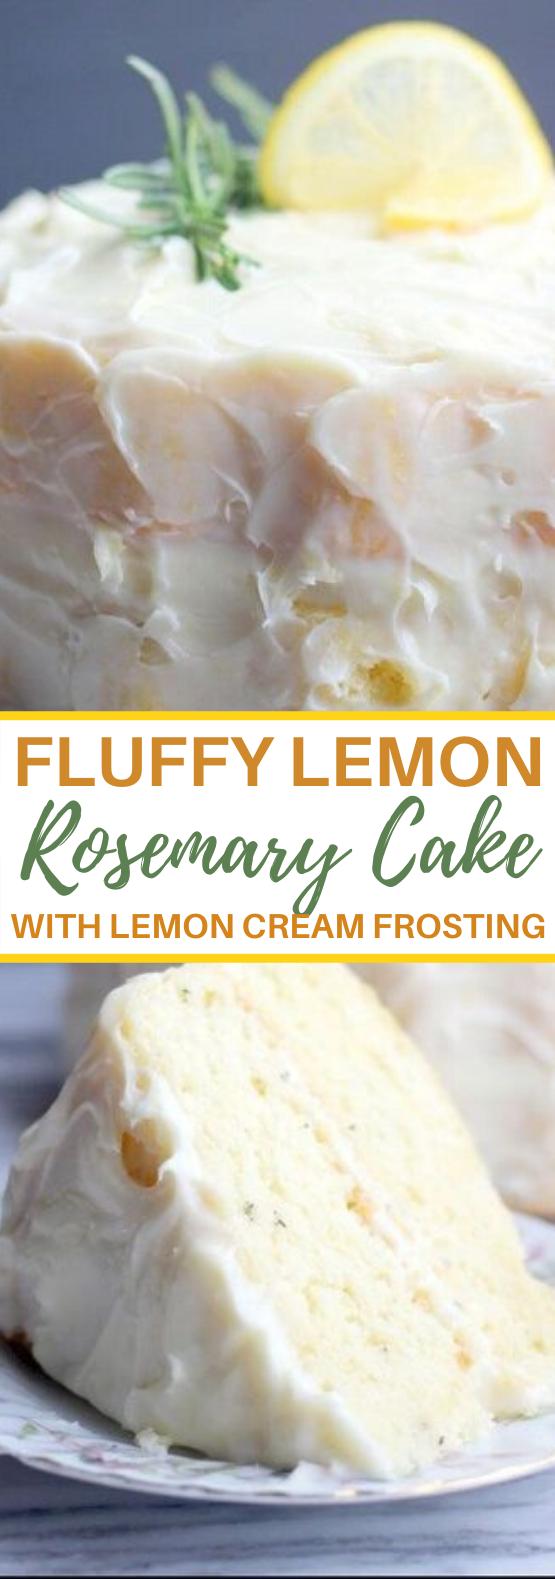 Fluffy Lemon Rosemary Cake with Lemon Cream Cheese Frosting #cake #recipes #baking #pastry #desserts